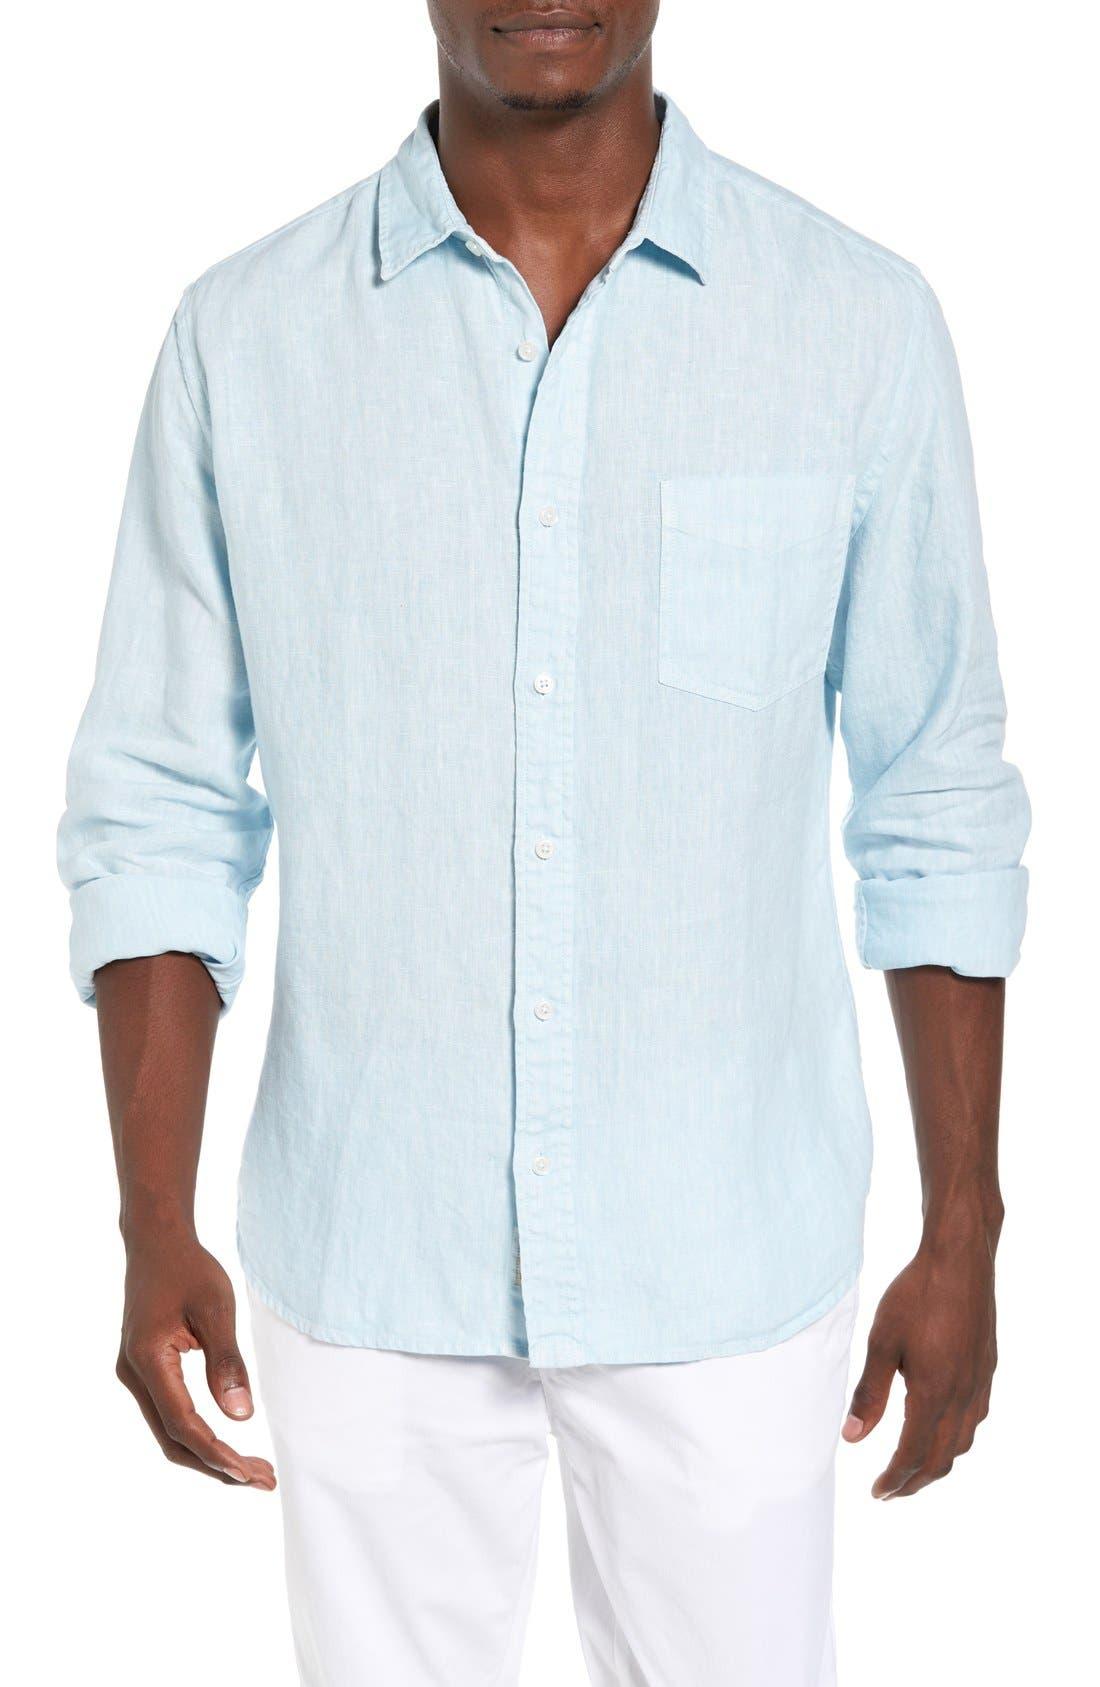 Main Image - Original Paperbacks Nice Trim Fit Linen Sport Shirt